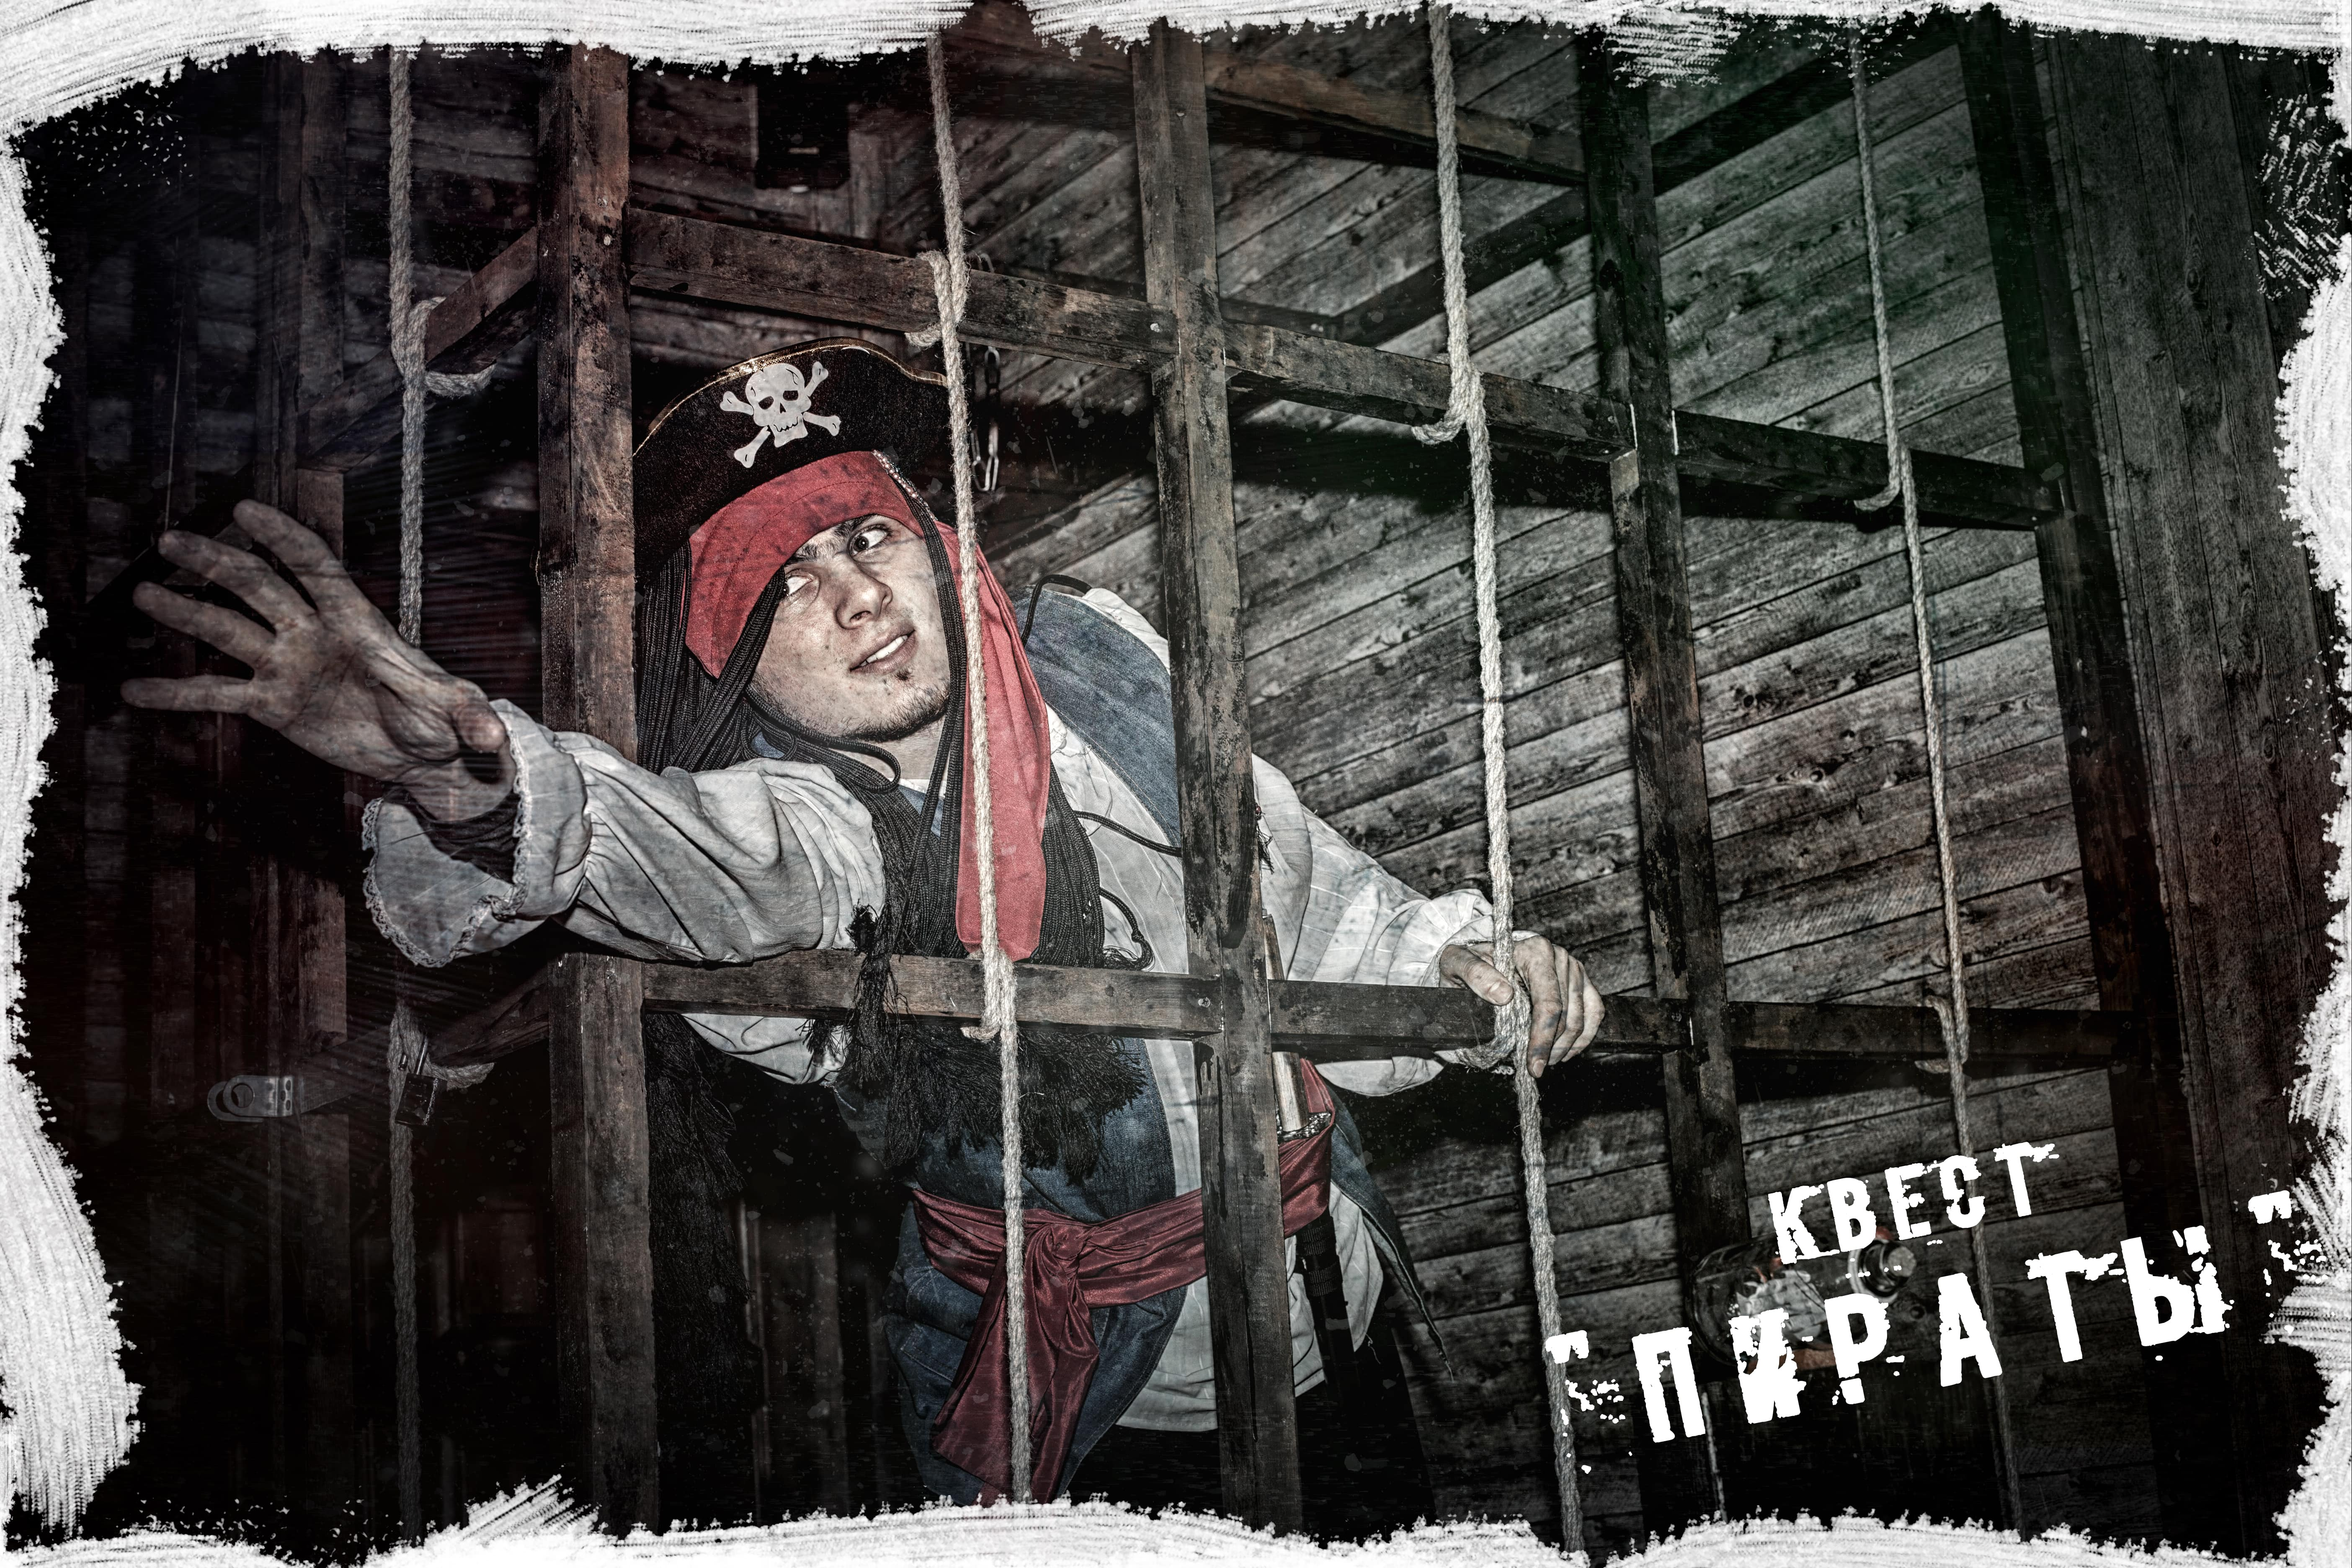 Квест Иркутск Пираты (19)